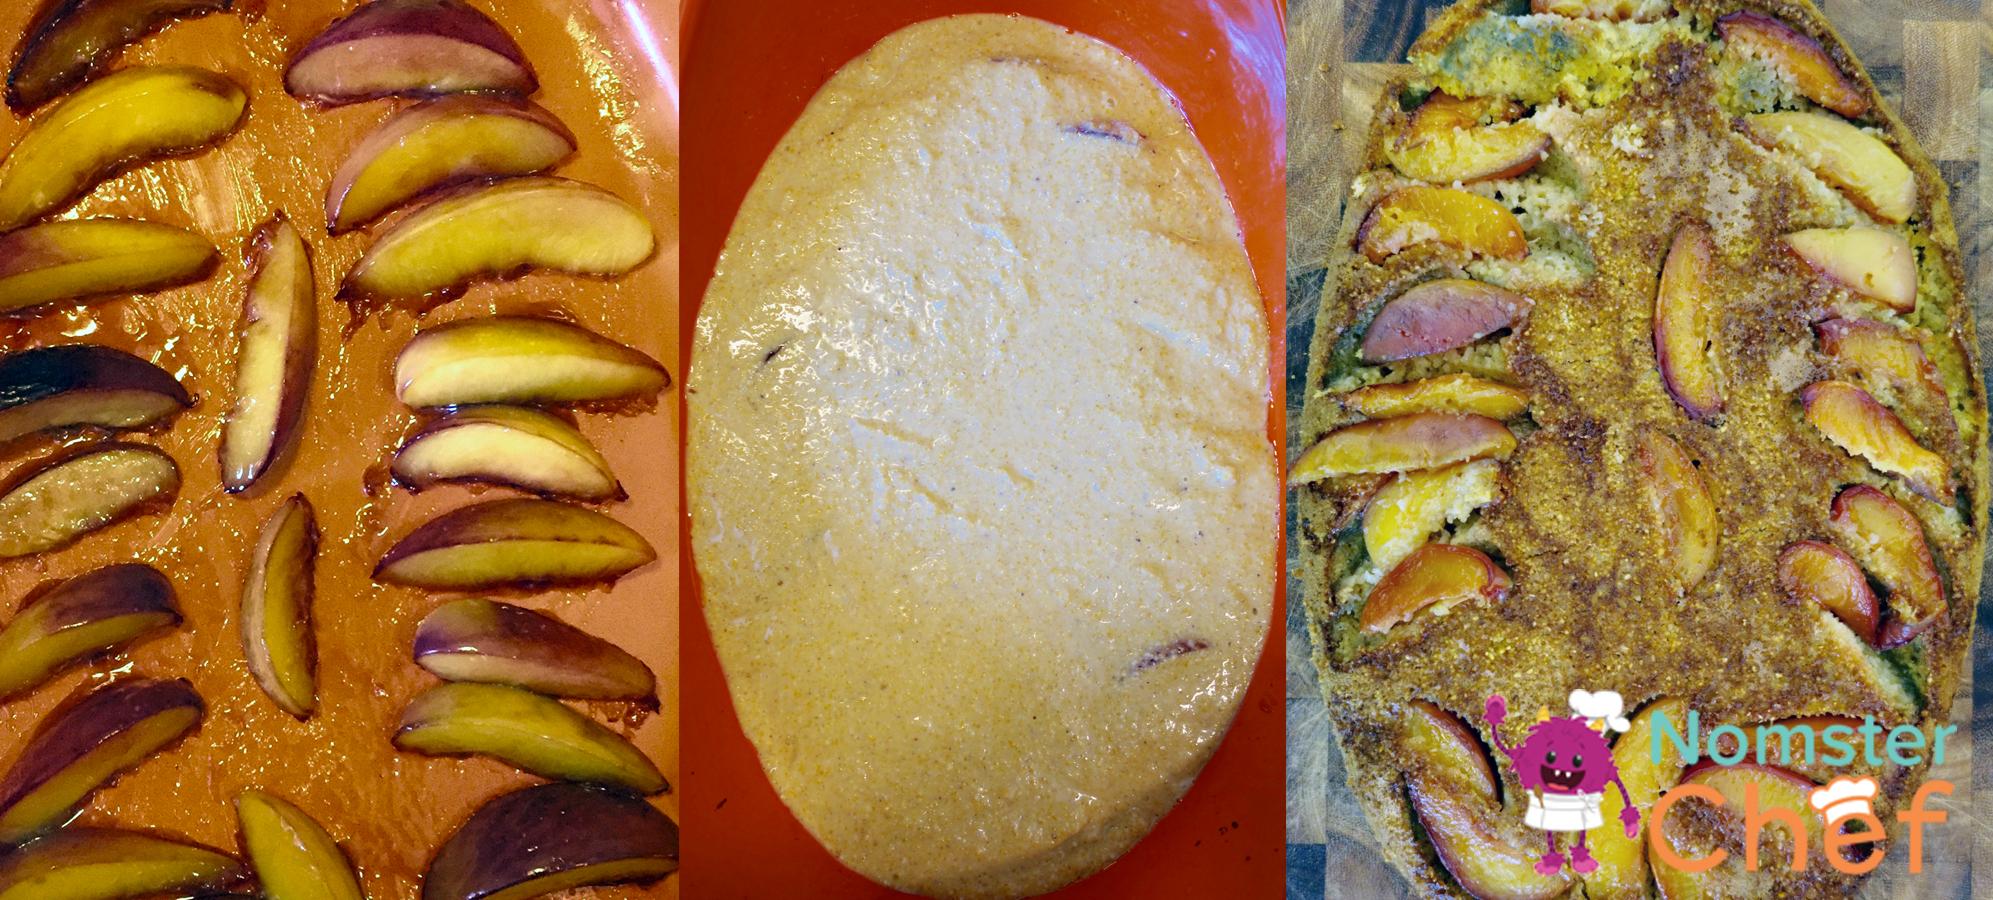 Nectarine Upside-Down Corn Cake - Nomster Chef Blog Recipe